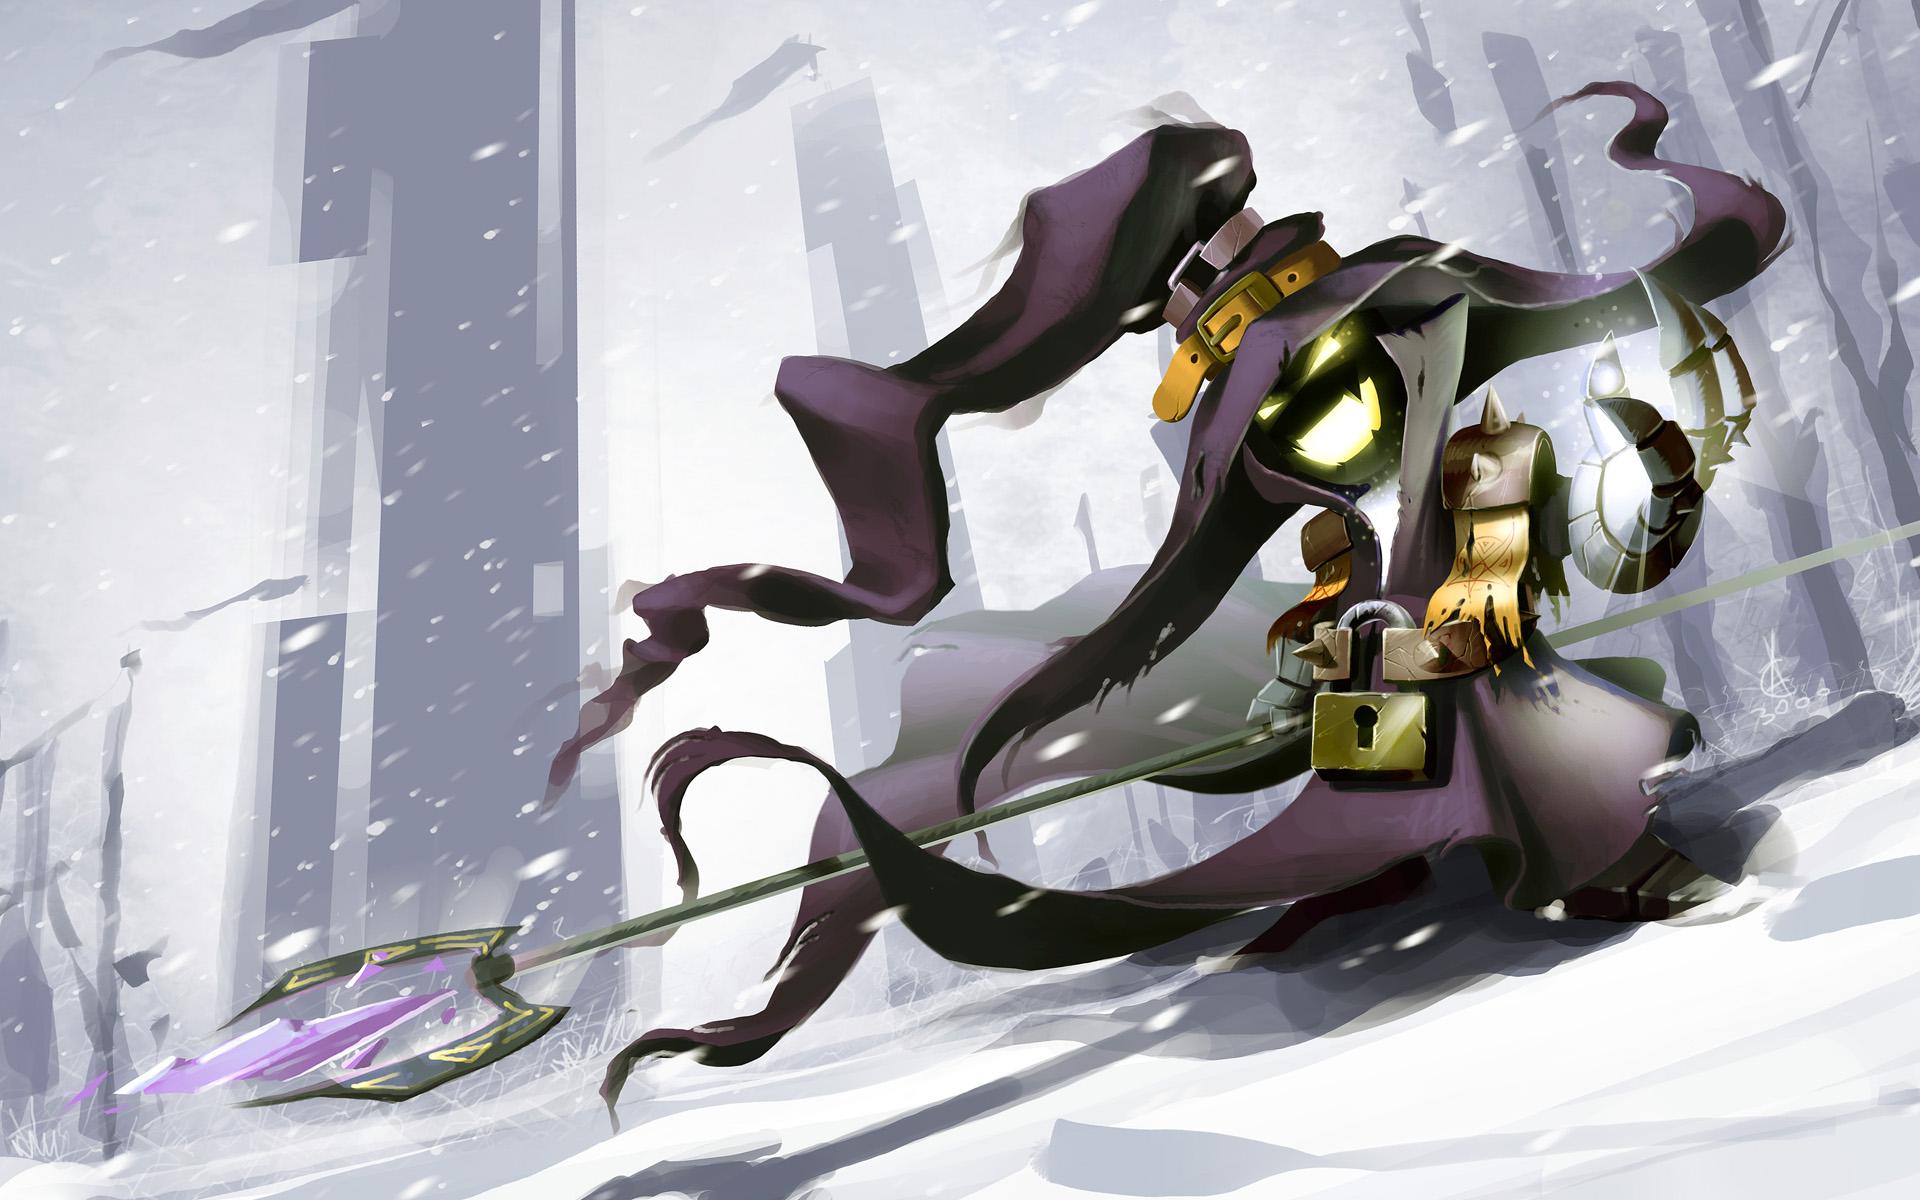 RE:【桌布】英雄聯盟高畫質桌布(圖多注意) @英雄聯盟 League of Legends 哈啦板 - 巴哈姆特